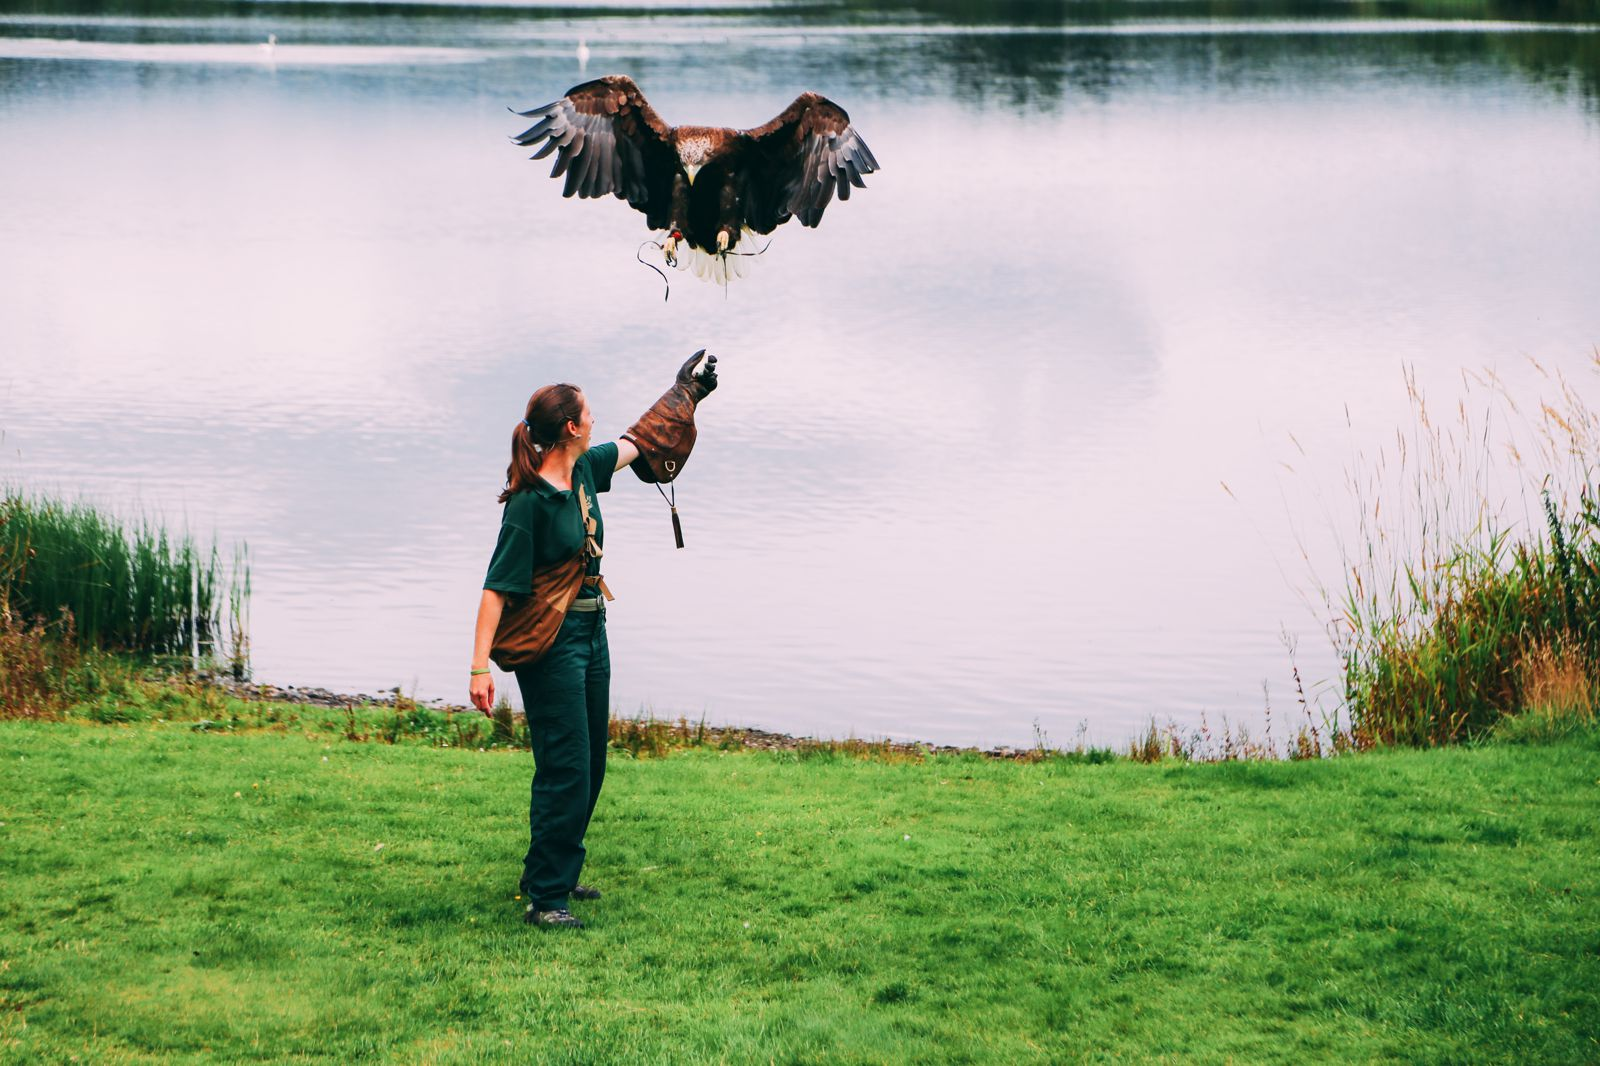 Safari In Scotland - The Photo Diary at Blair Drummond Safari and Adventure Park (30)